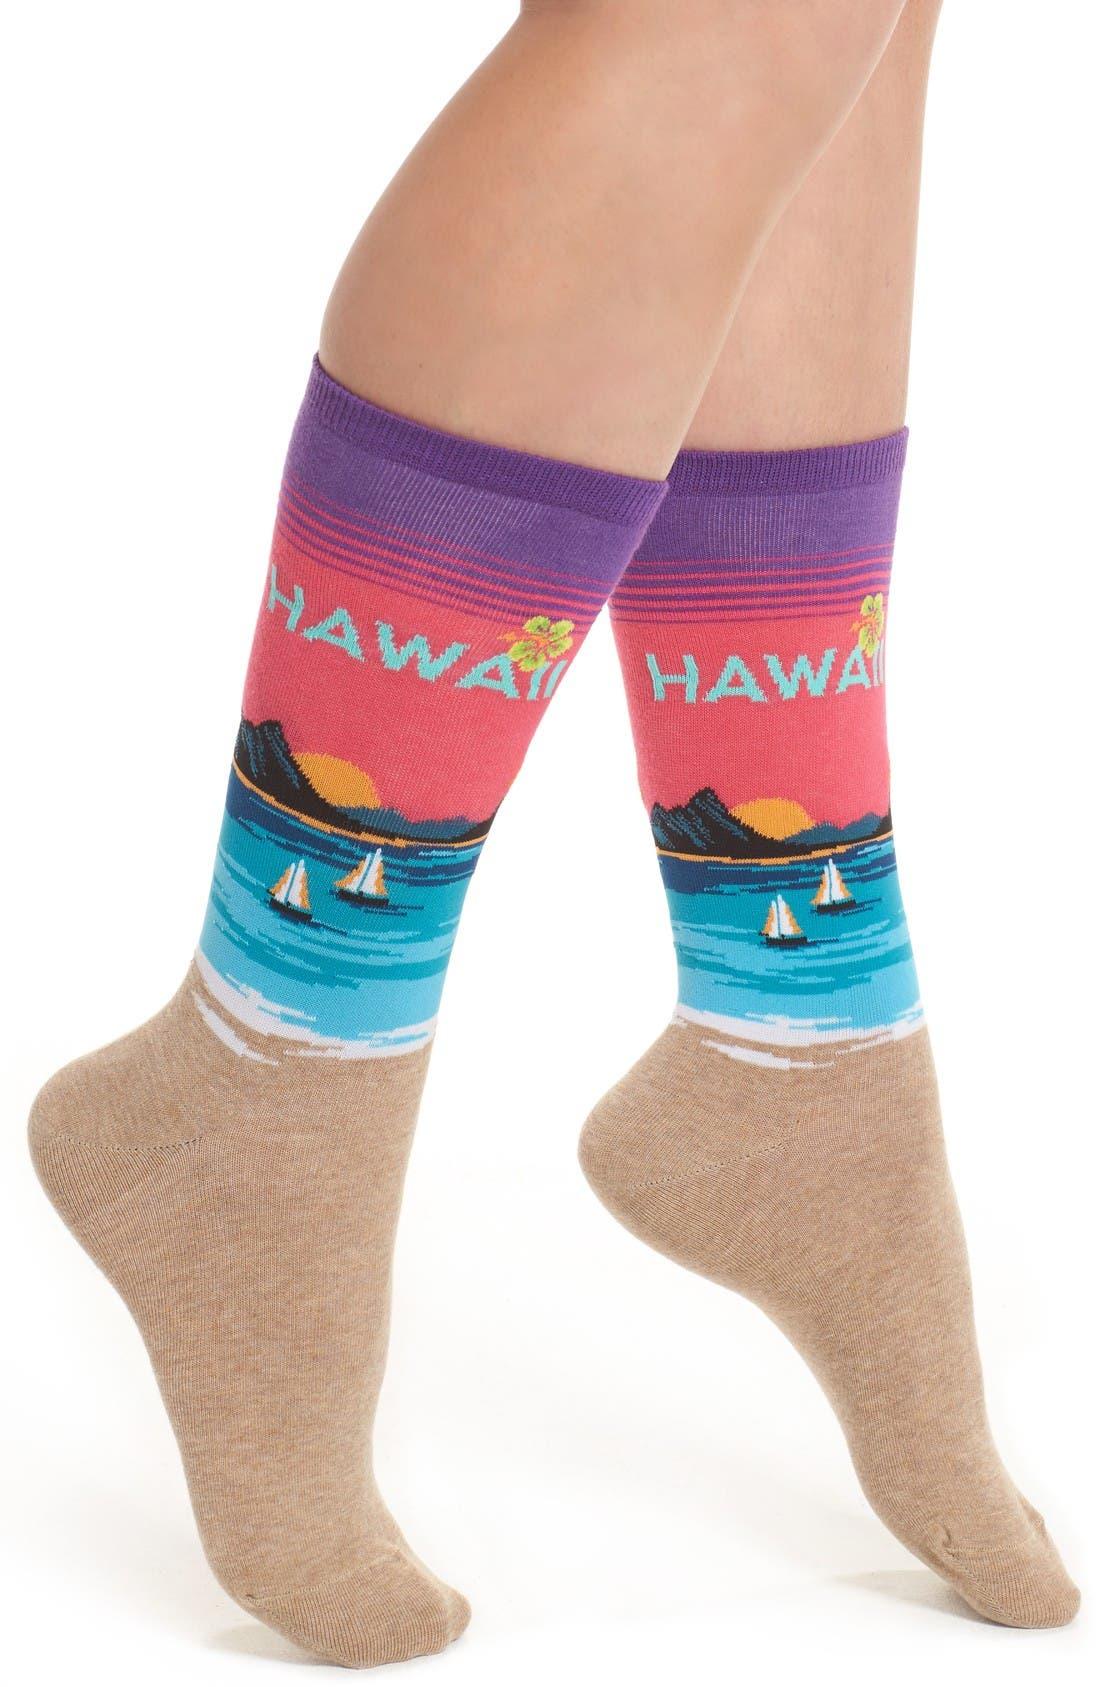 Main Image - Hot Sox Hawaii Crew Socks